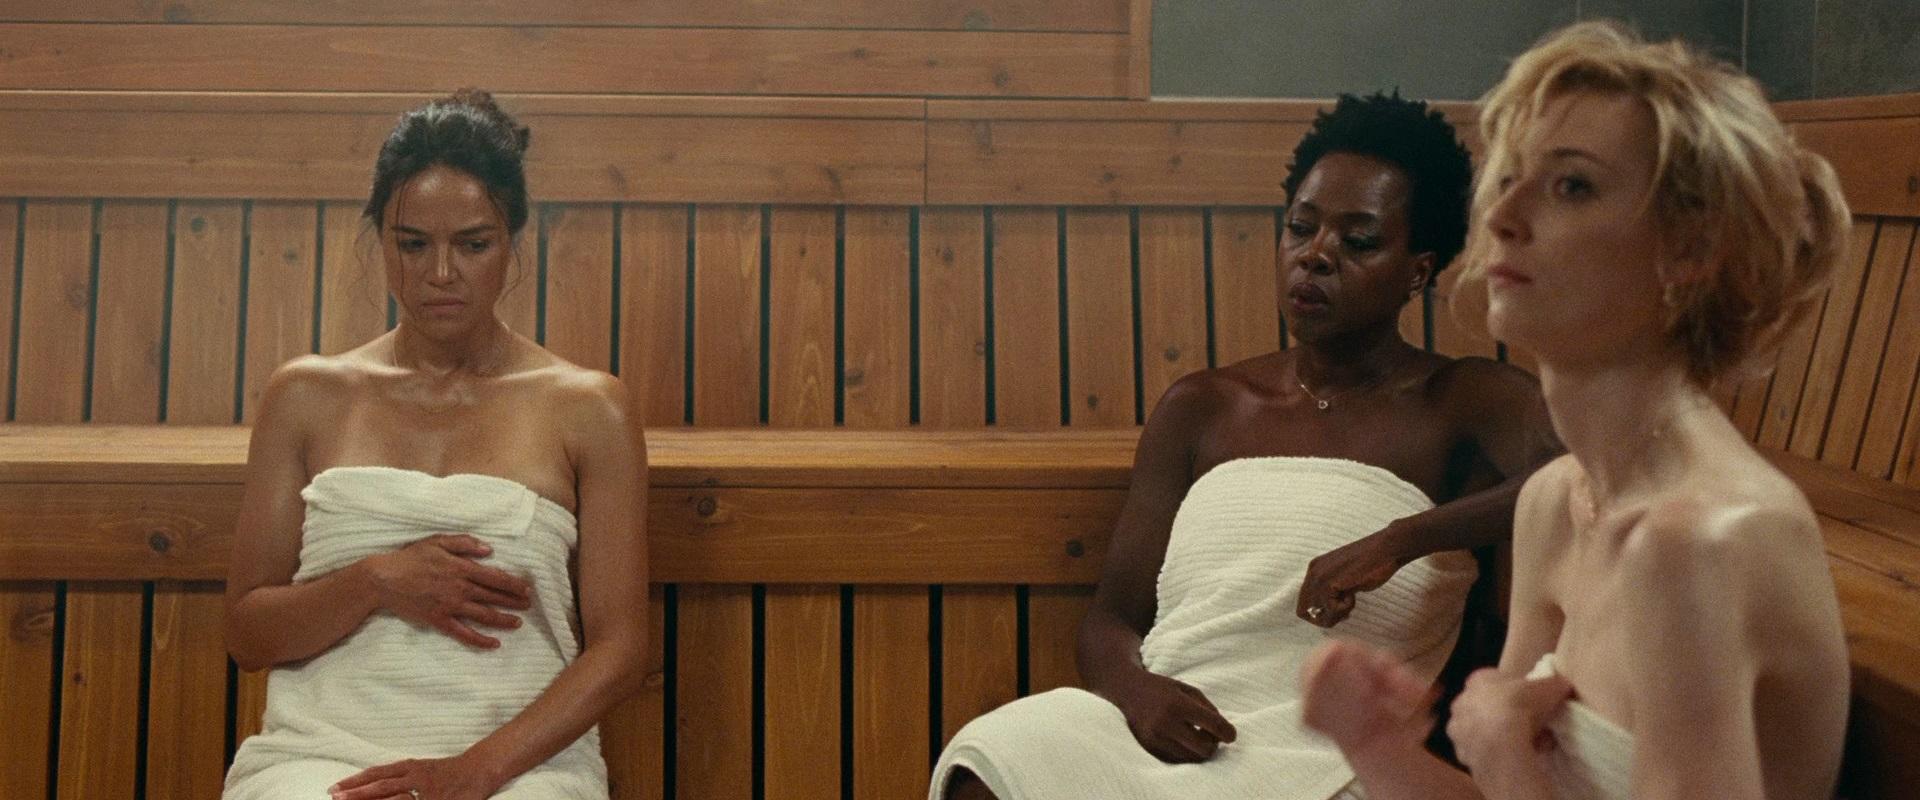 Dul Kadınlar | Widows | 2018 | BDRip | XviD | Türkçe Dublaj | m720p - m1080p | BluRay | Dual | TR-EN | Tek Link